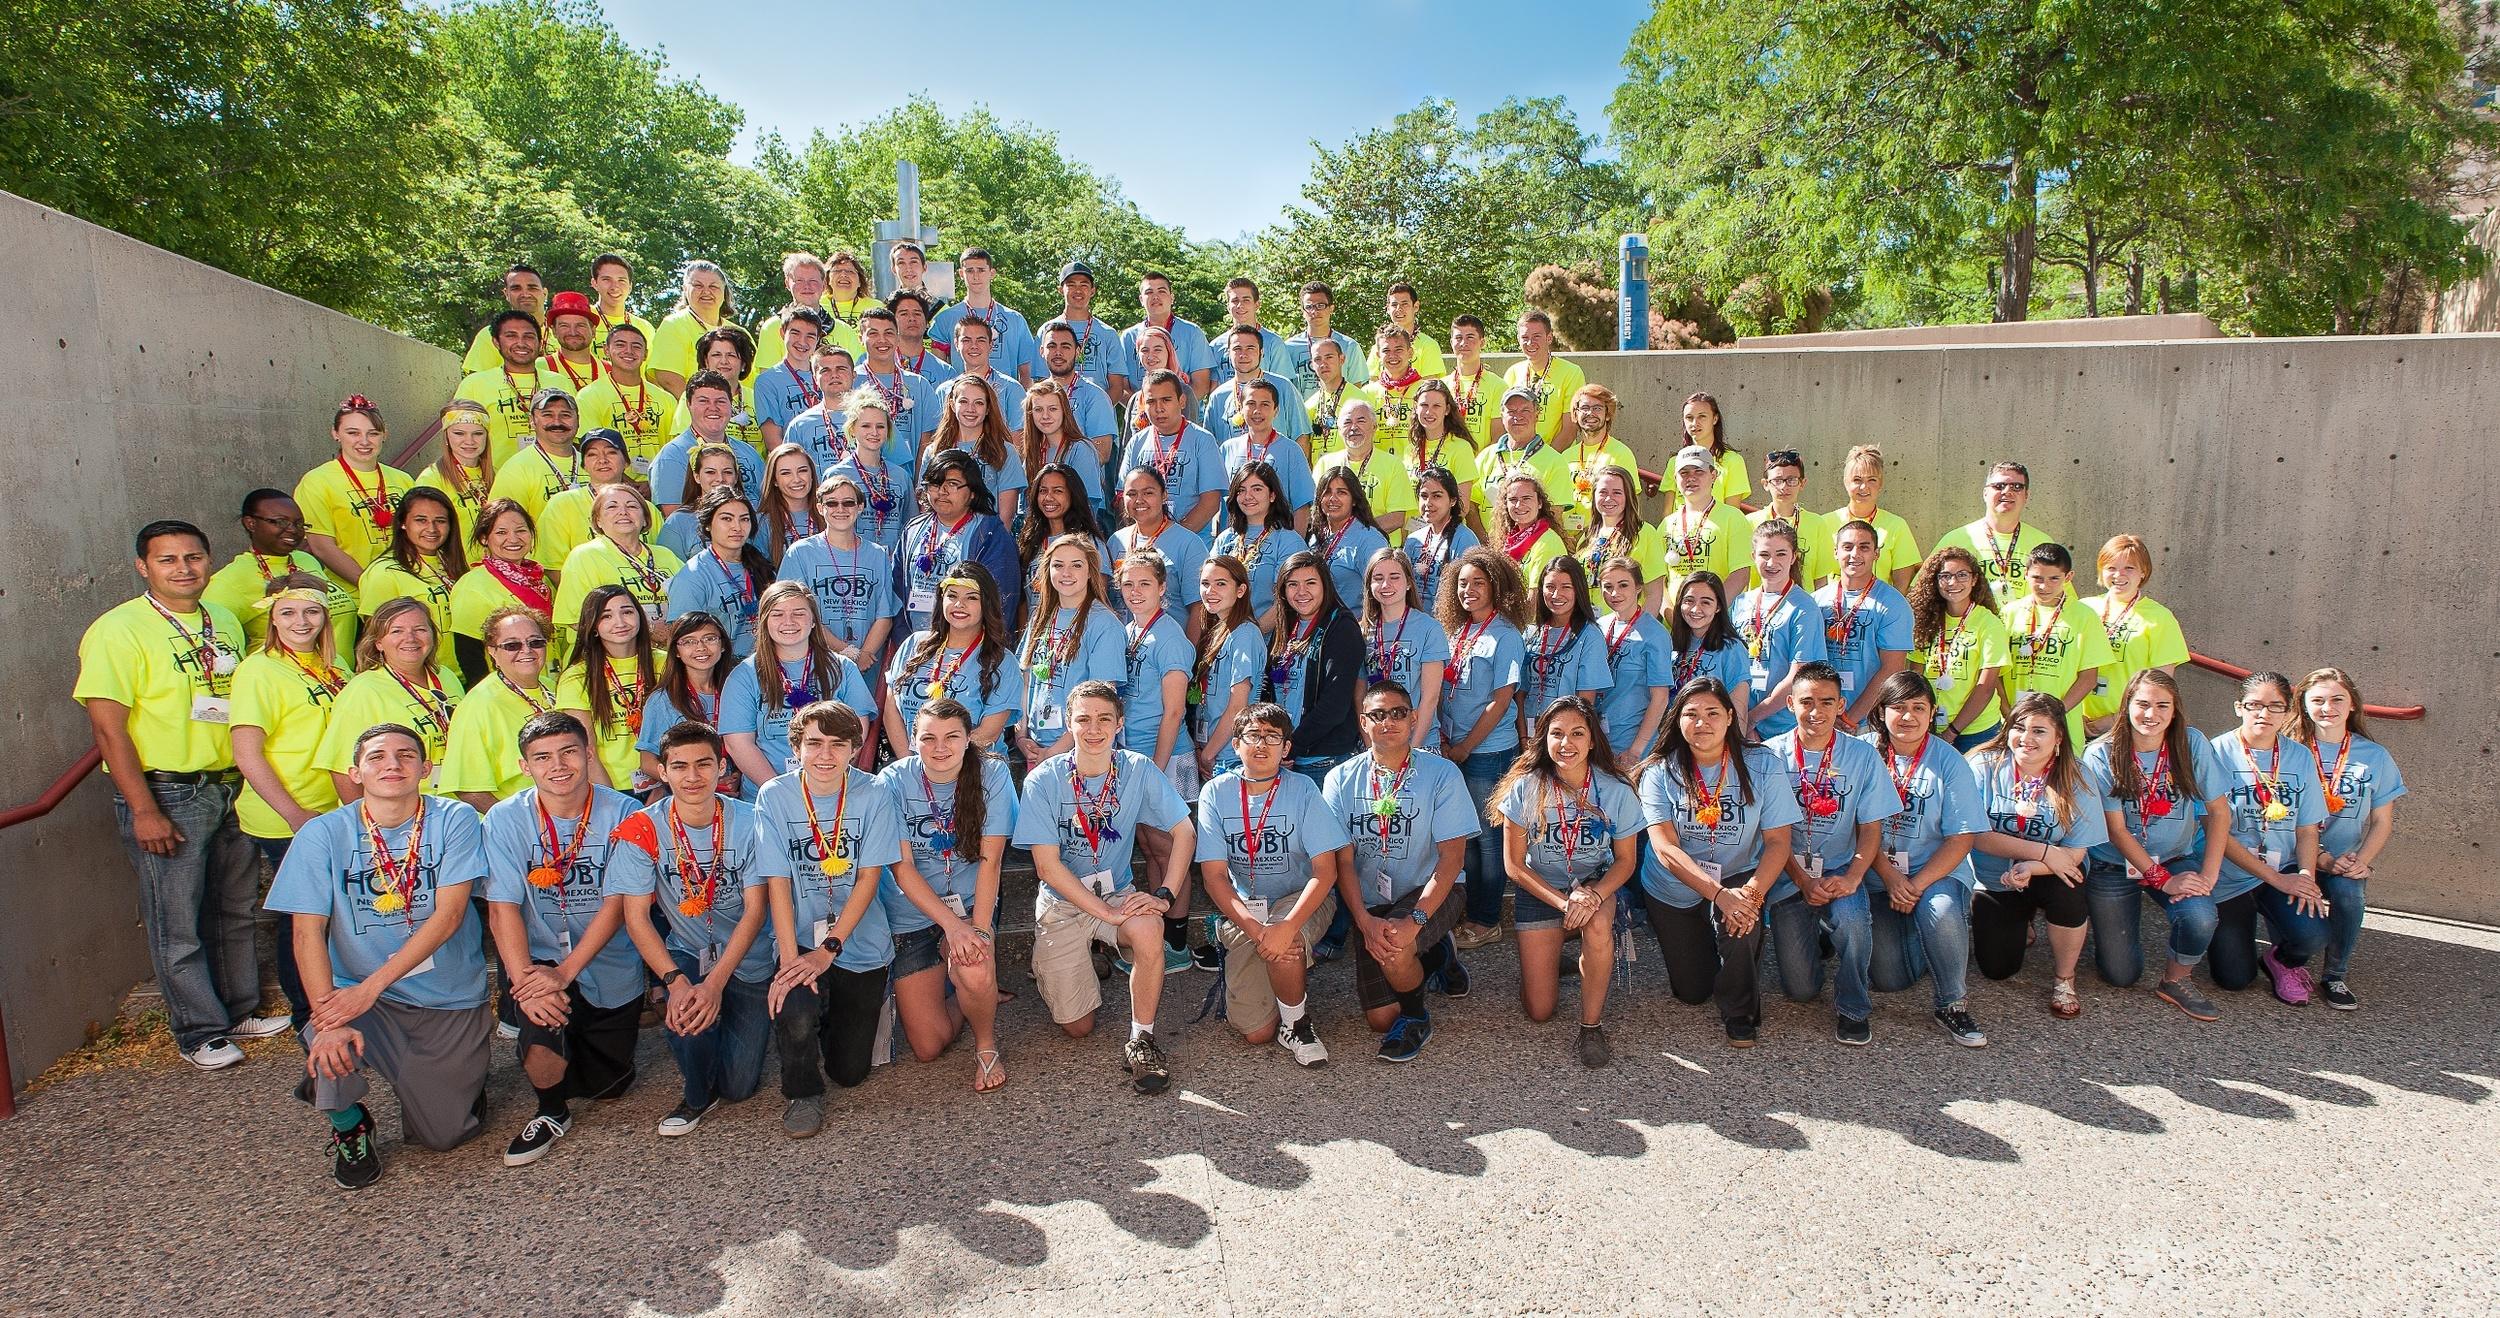 2015 HOBY New Mexico Leadership Seminar